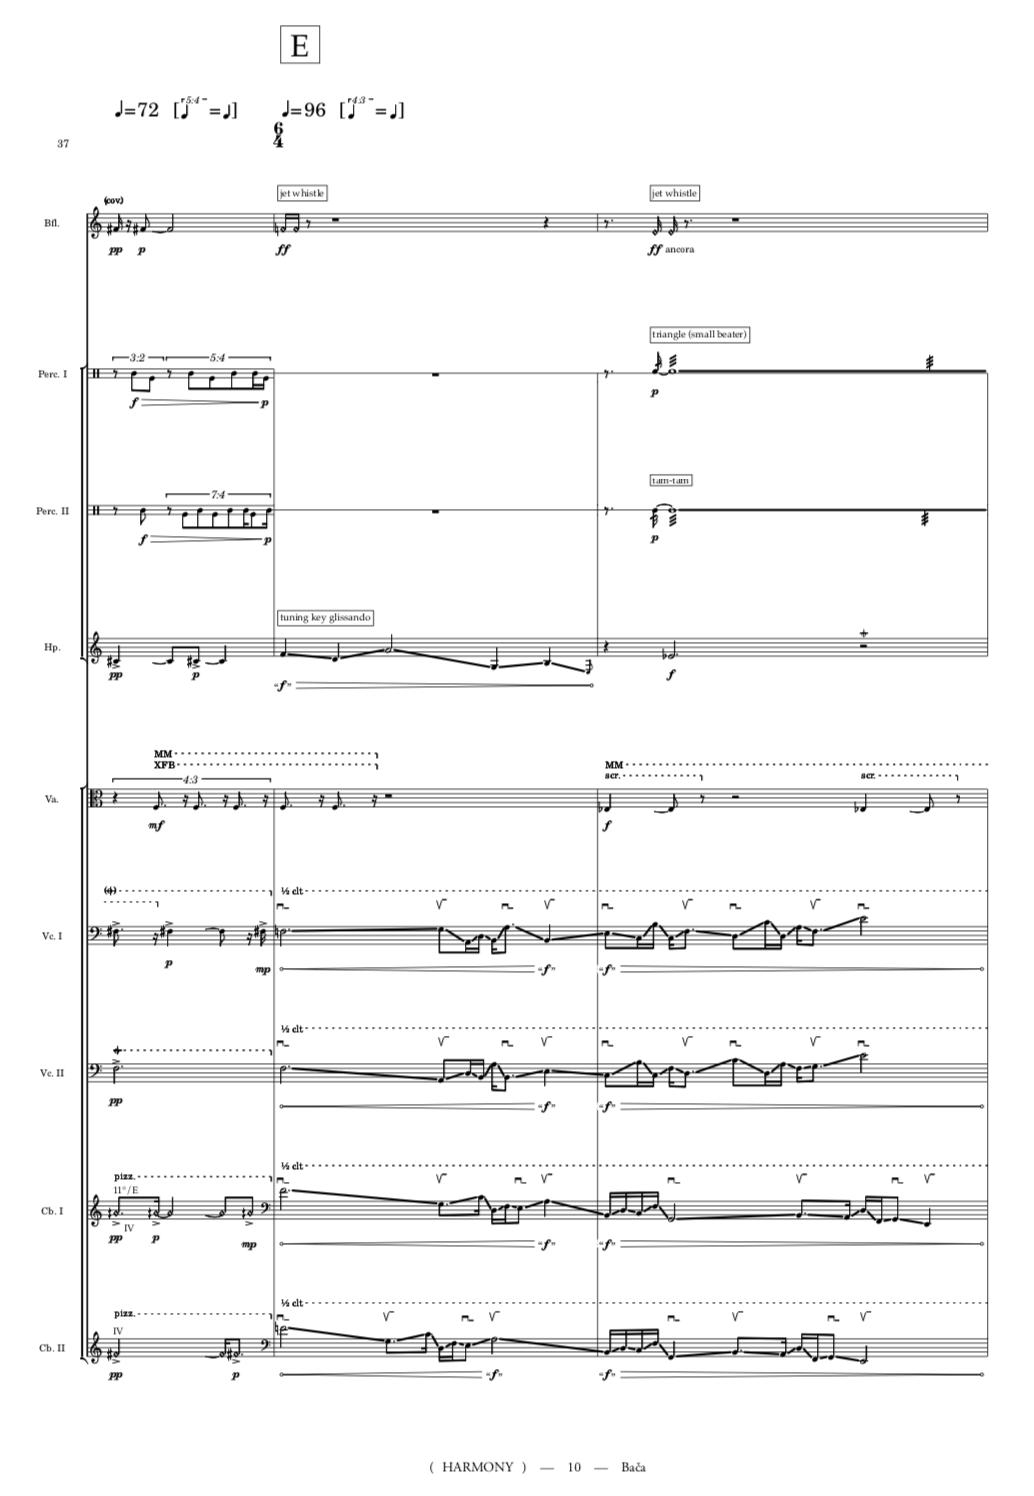 Harmony-page-10-1